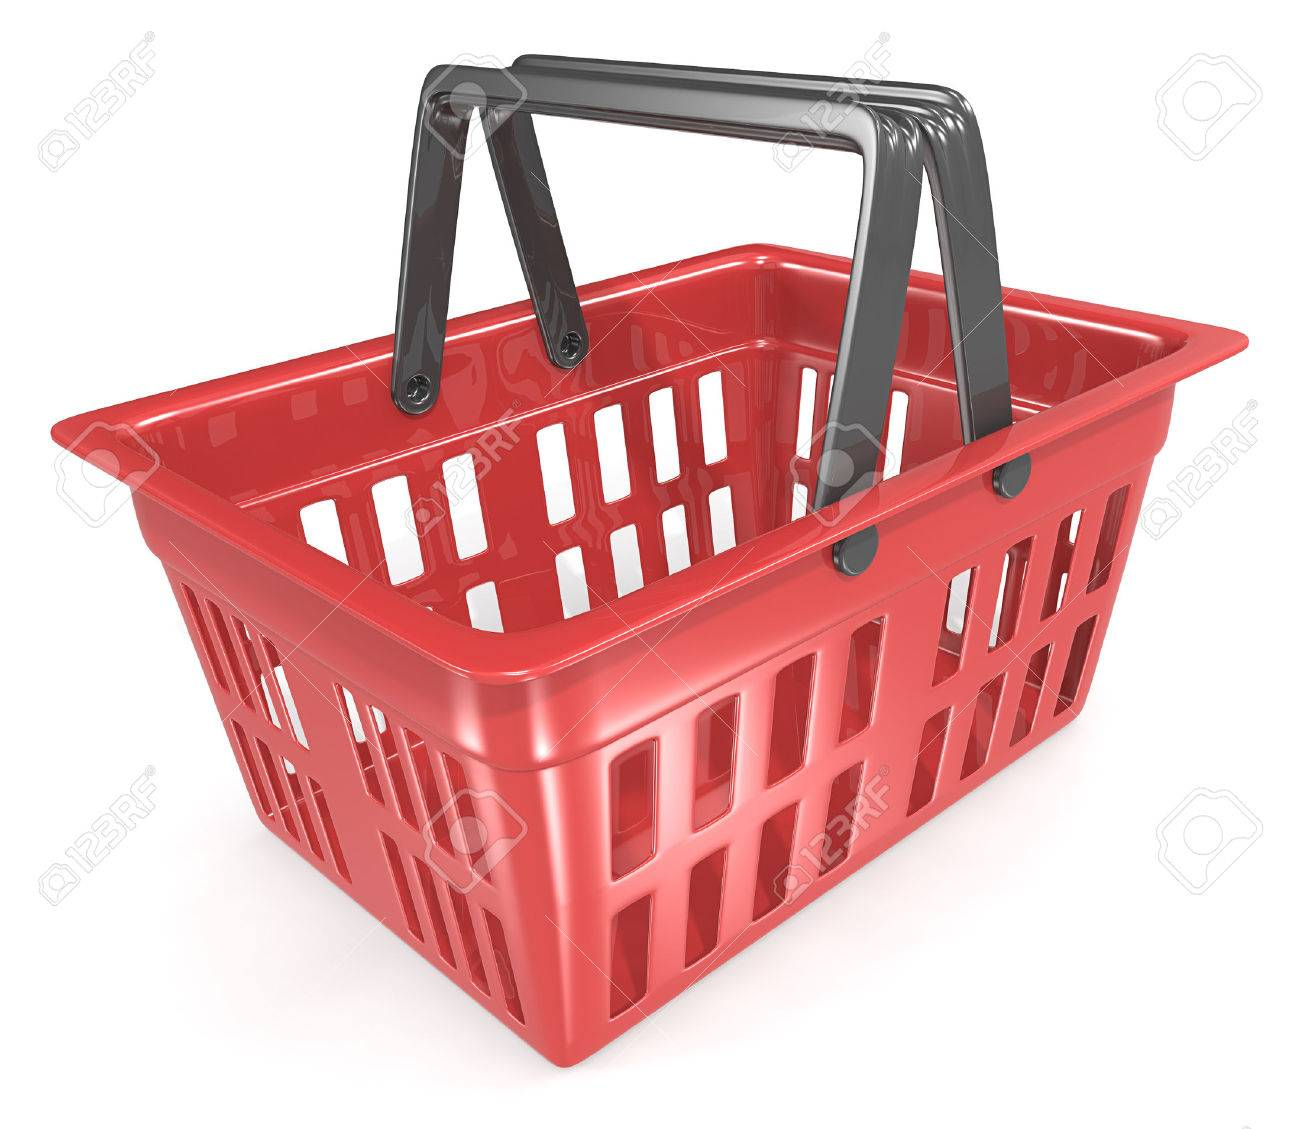 Shopping Basket. Empty Red Shopping Basket. Standard-Bild - 45761499